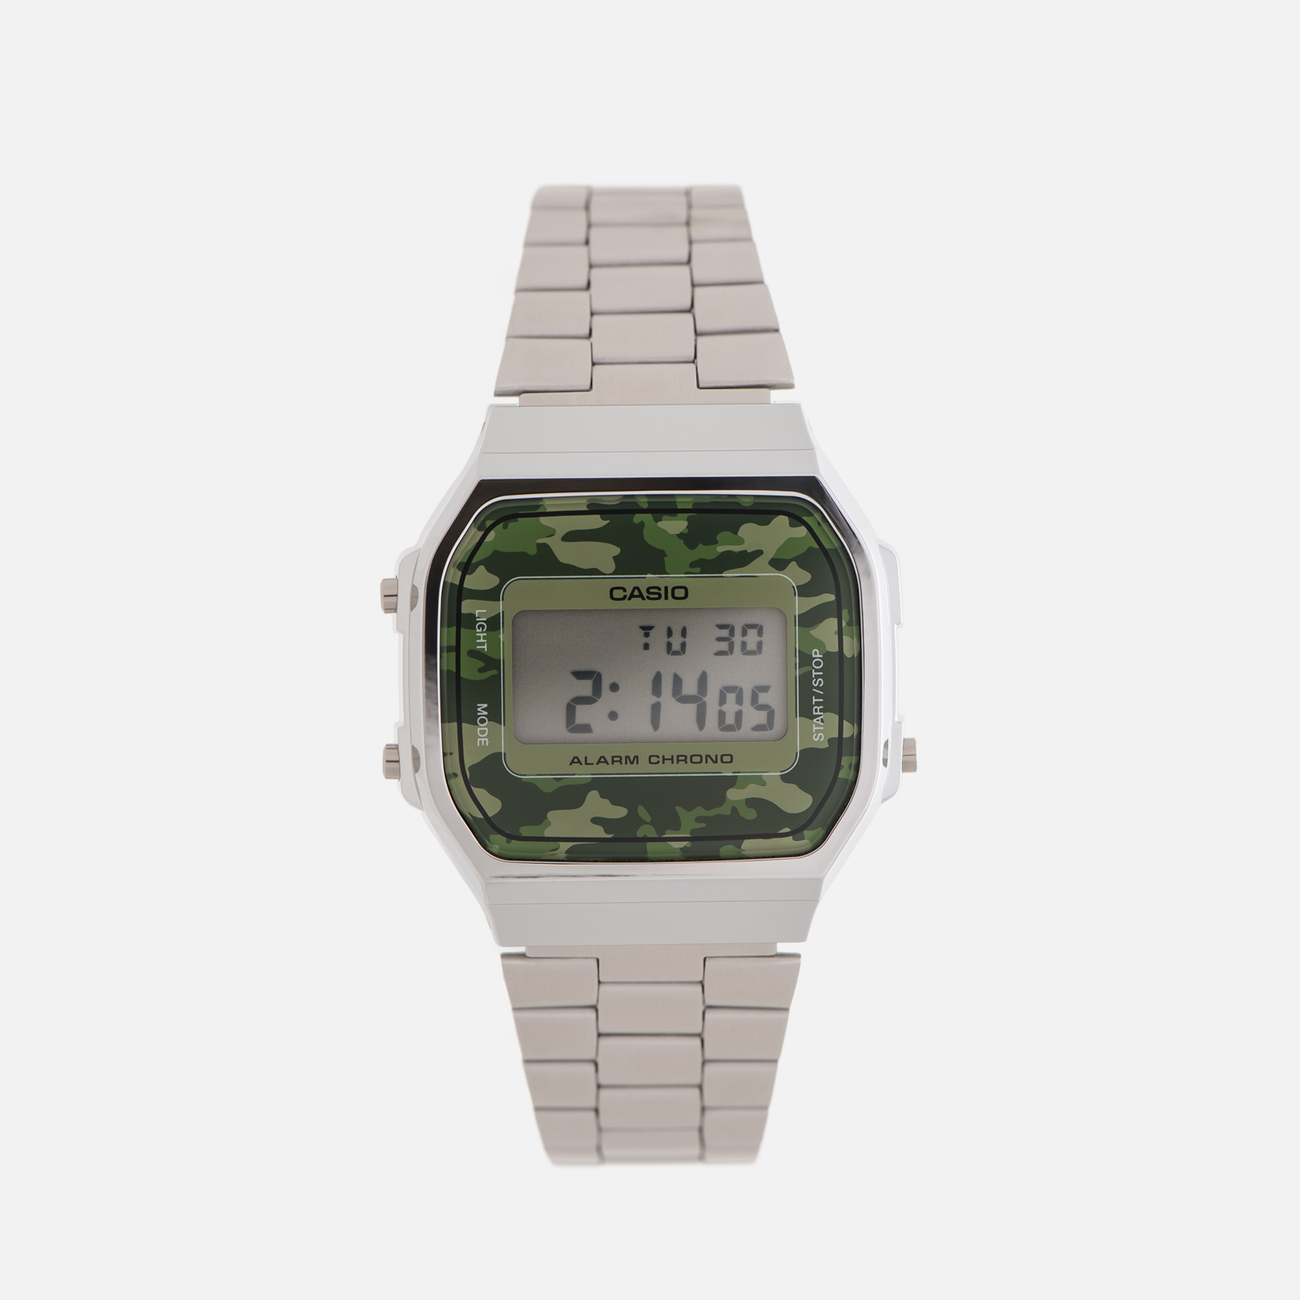 Наручные часы CASIO Collection A-168WEC-3E Silver/Green Camo